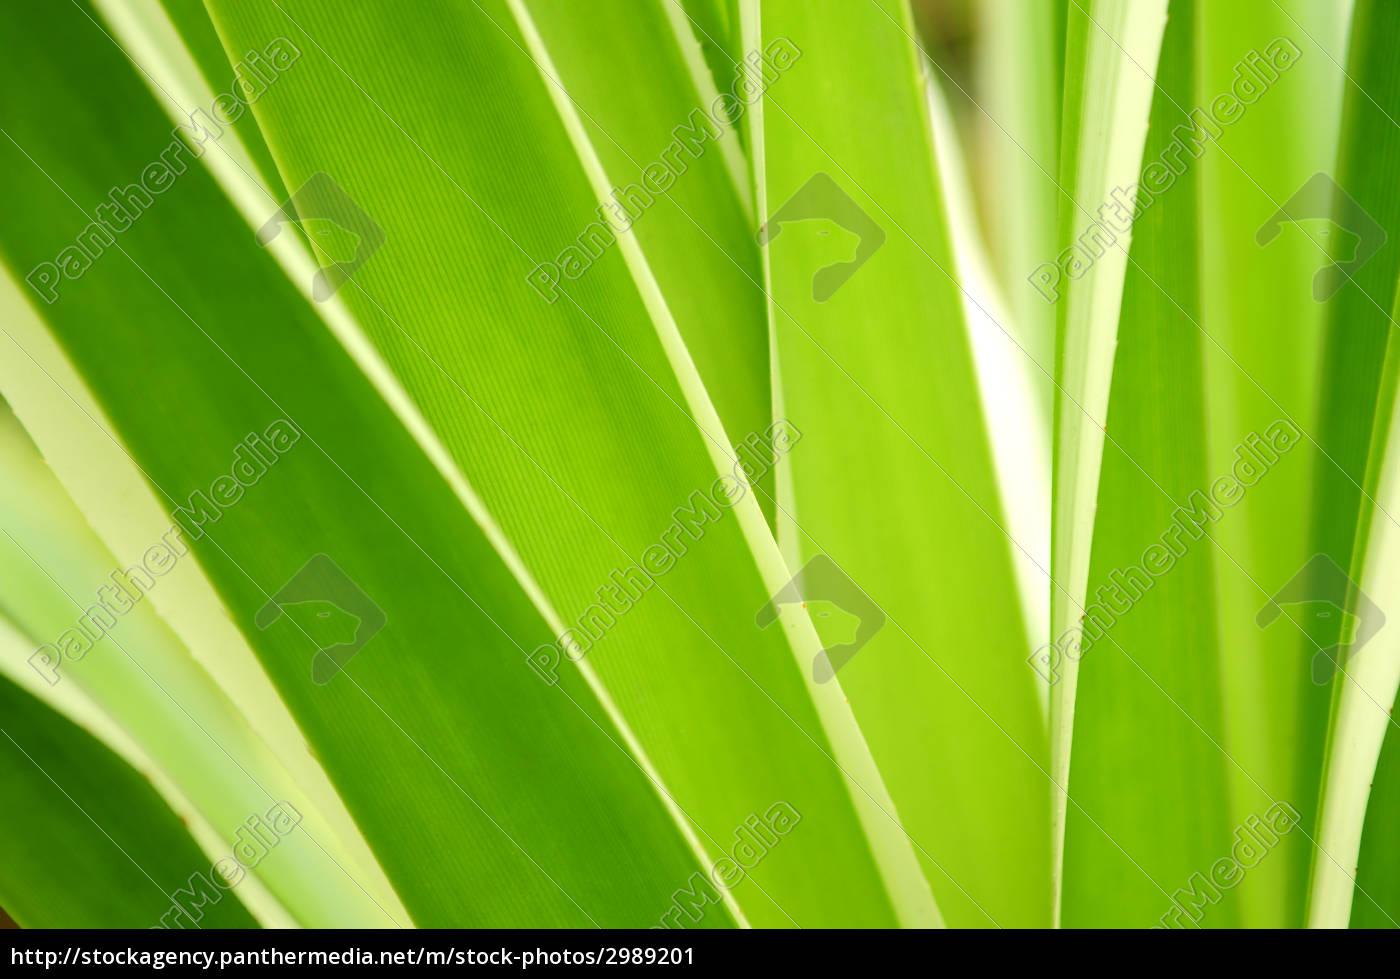 tropical, leaves - 2989201